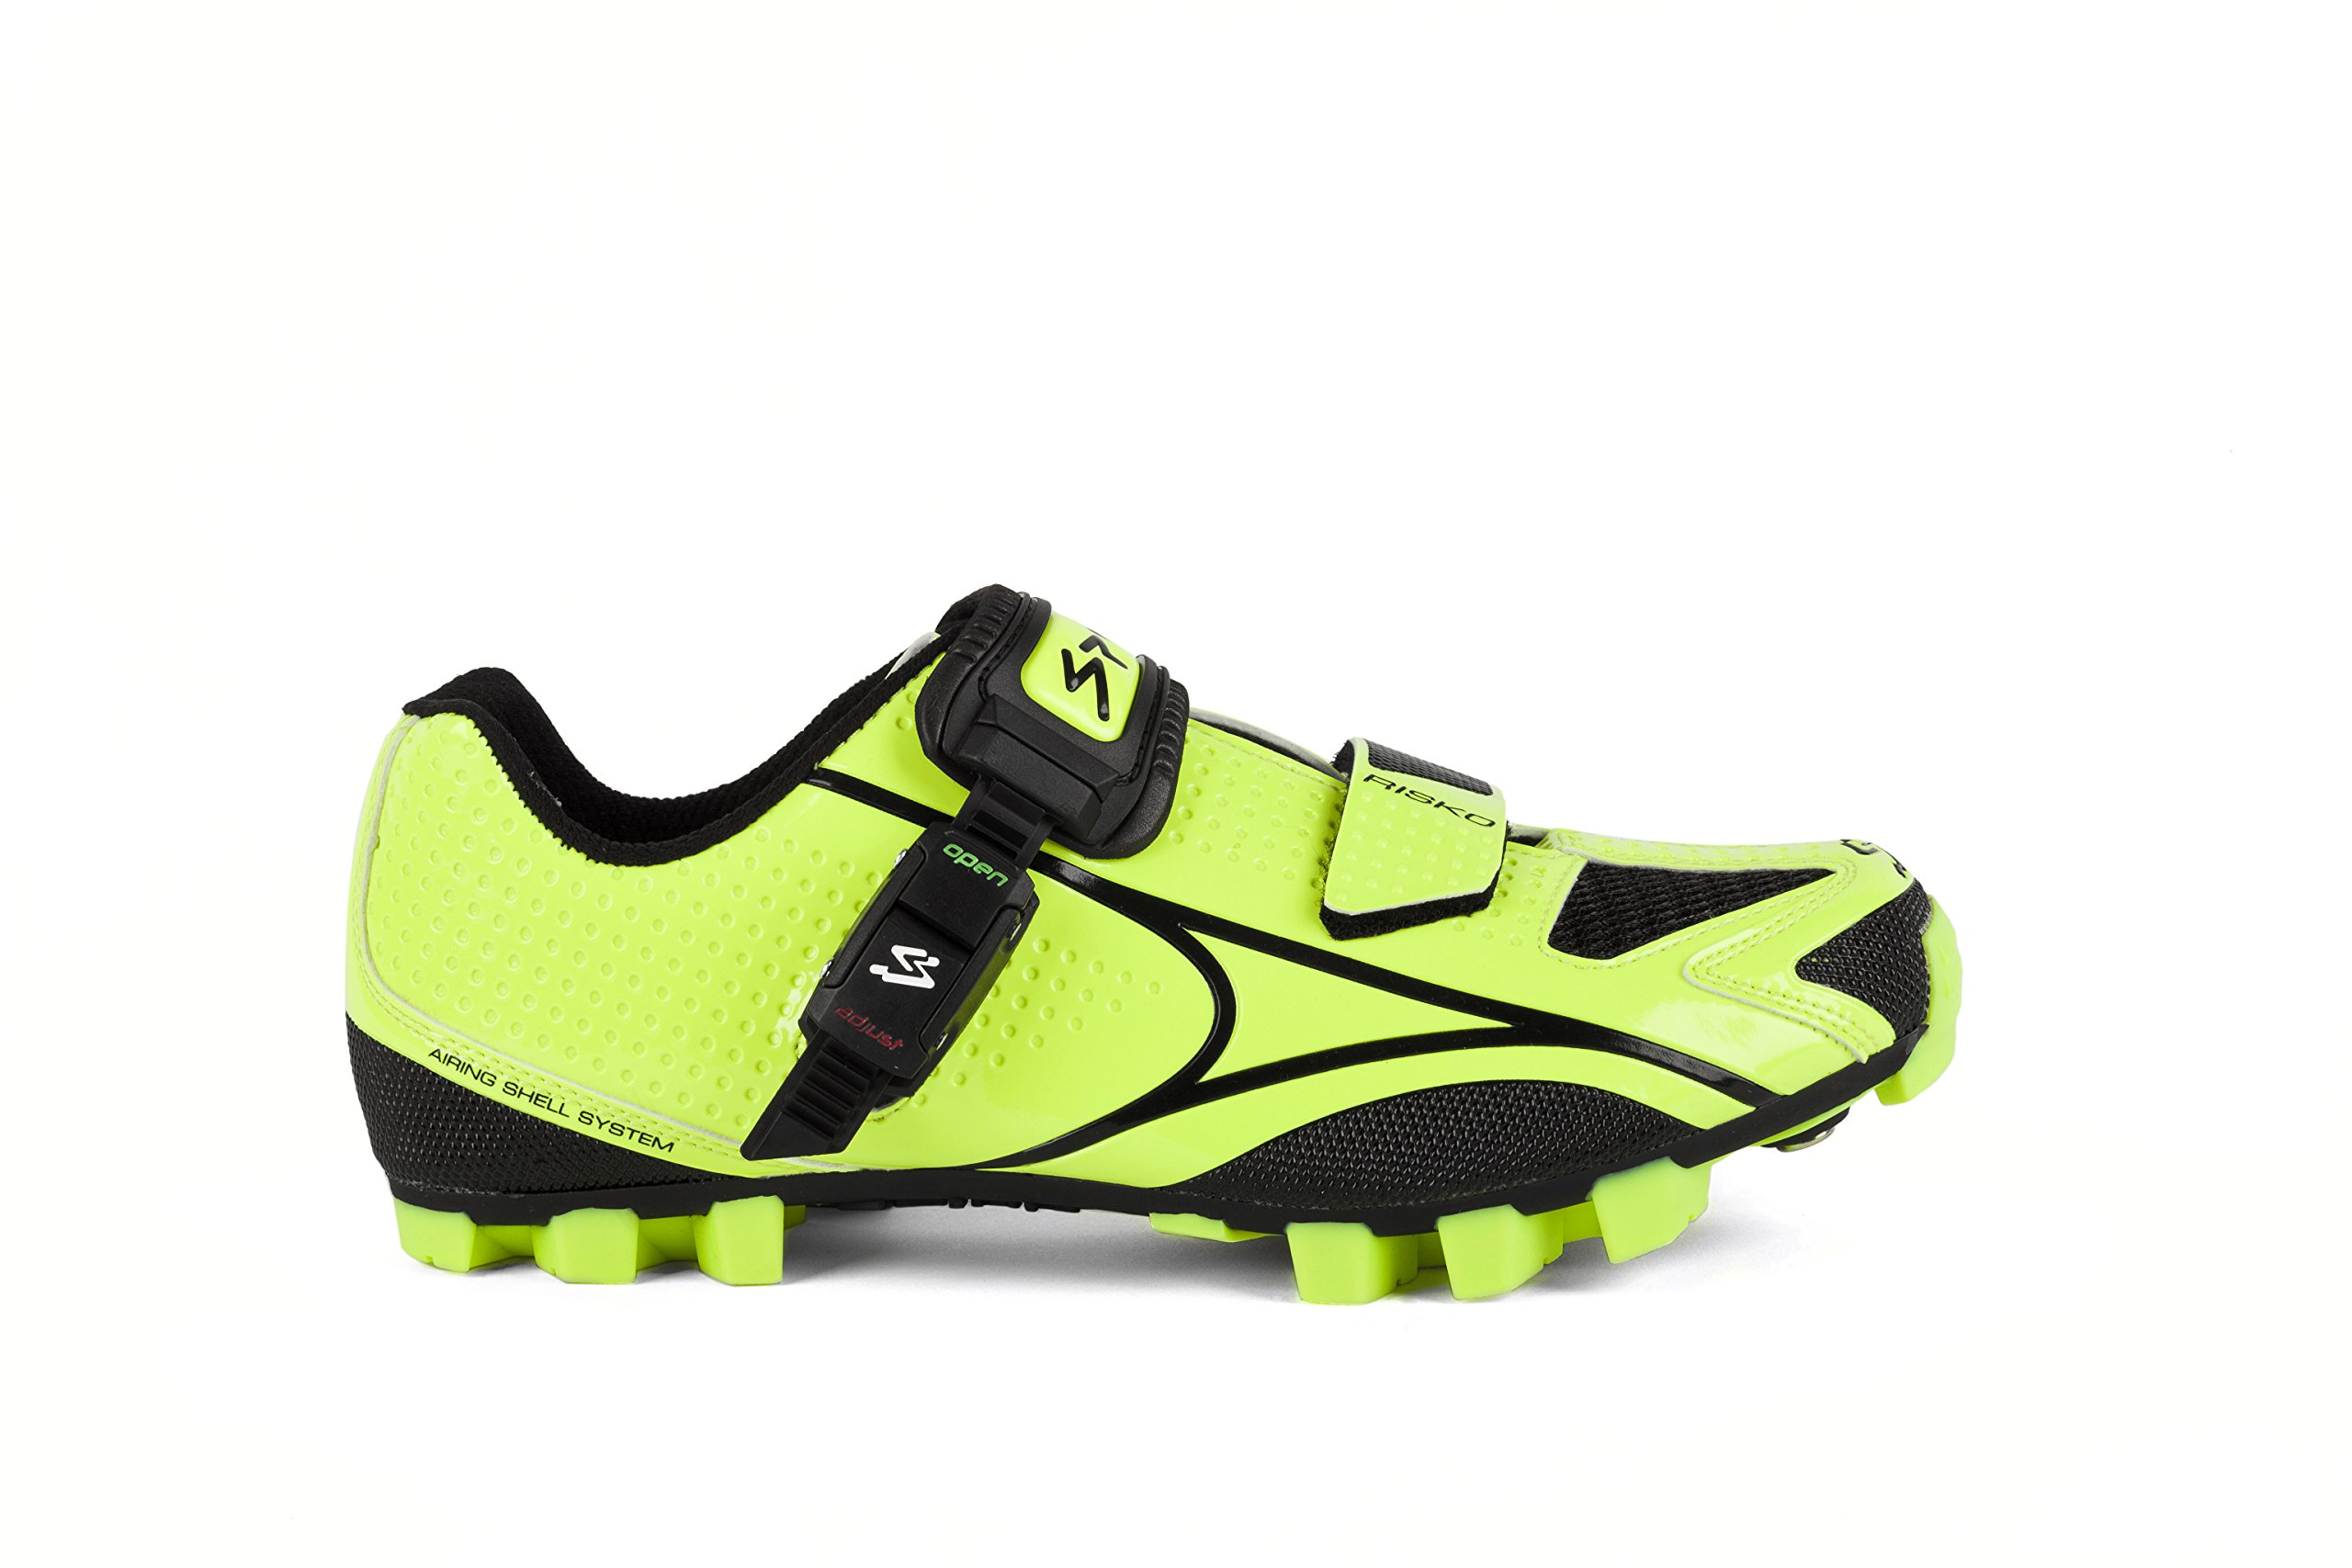 Spiuk New Risko Neon Shoes 2016